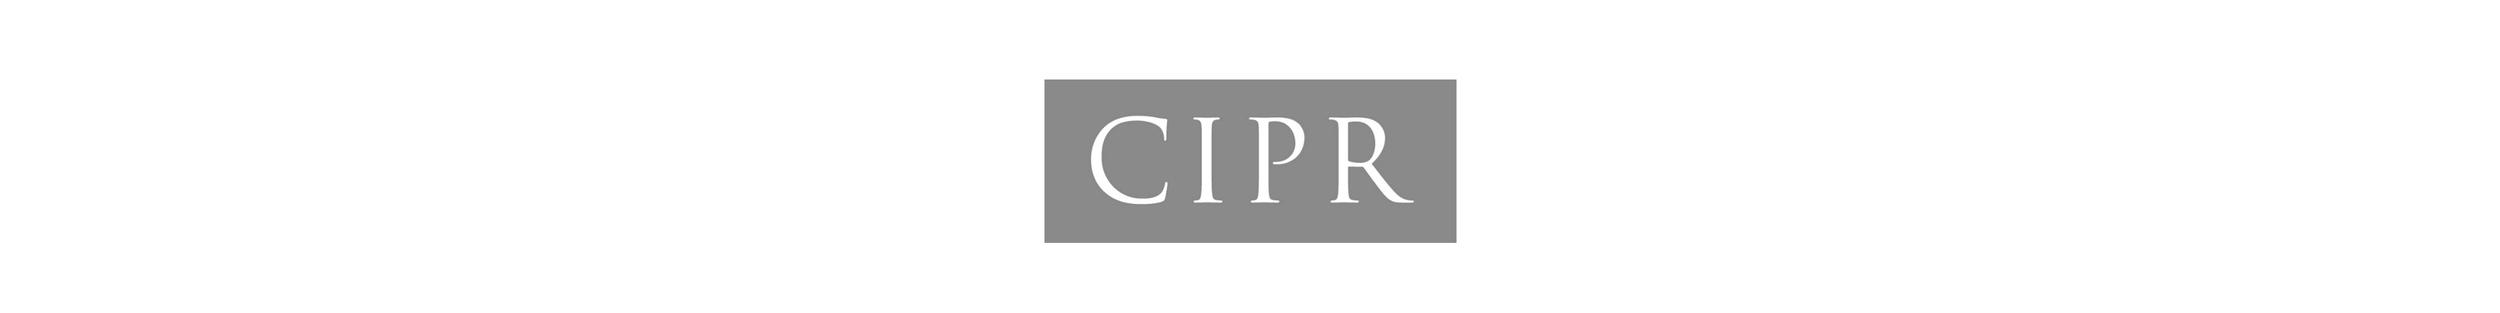 CIPR.jpg